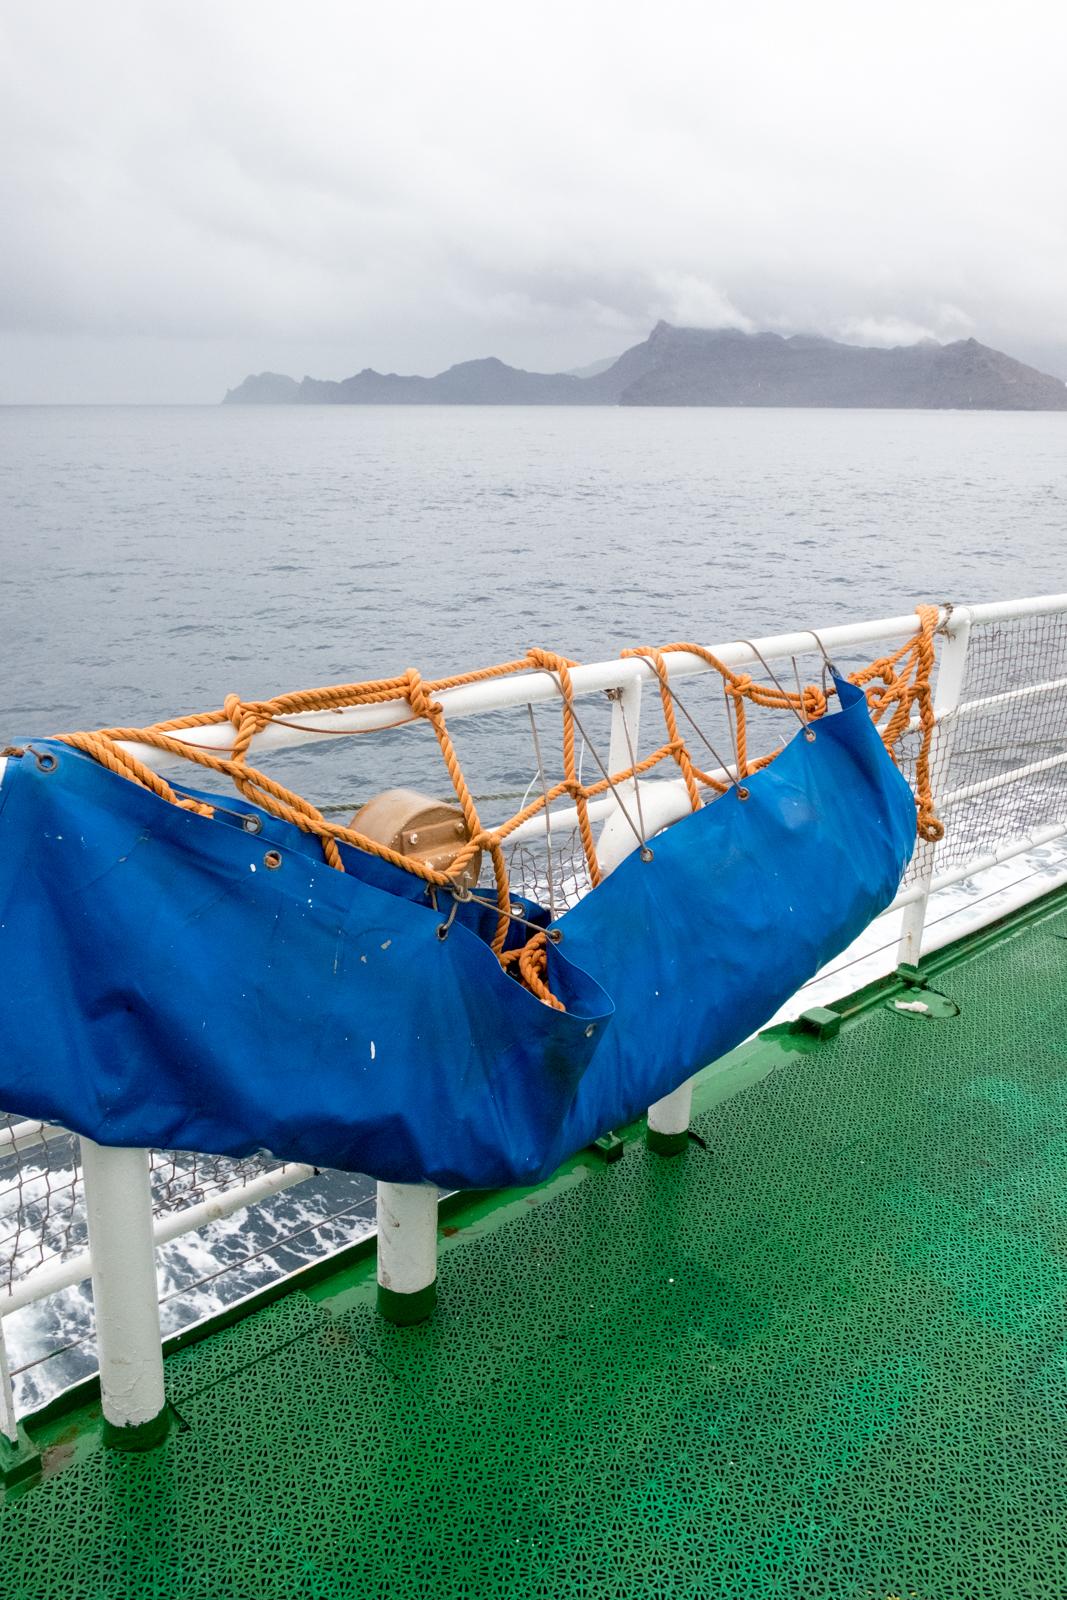 DSCF9877 - It never rains on Cabo Verde